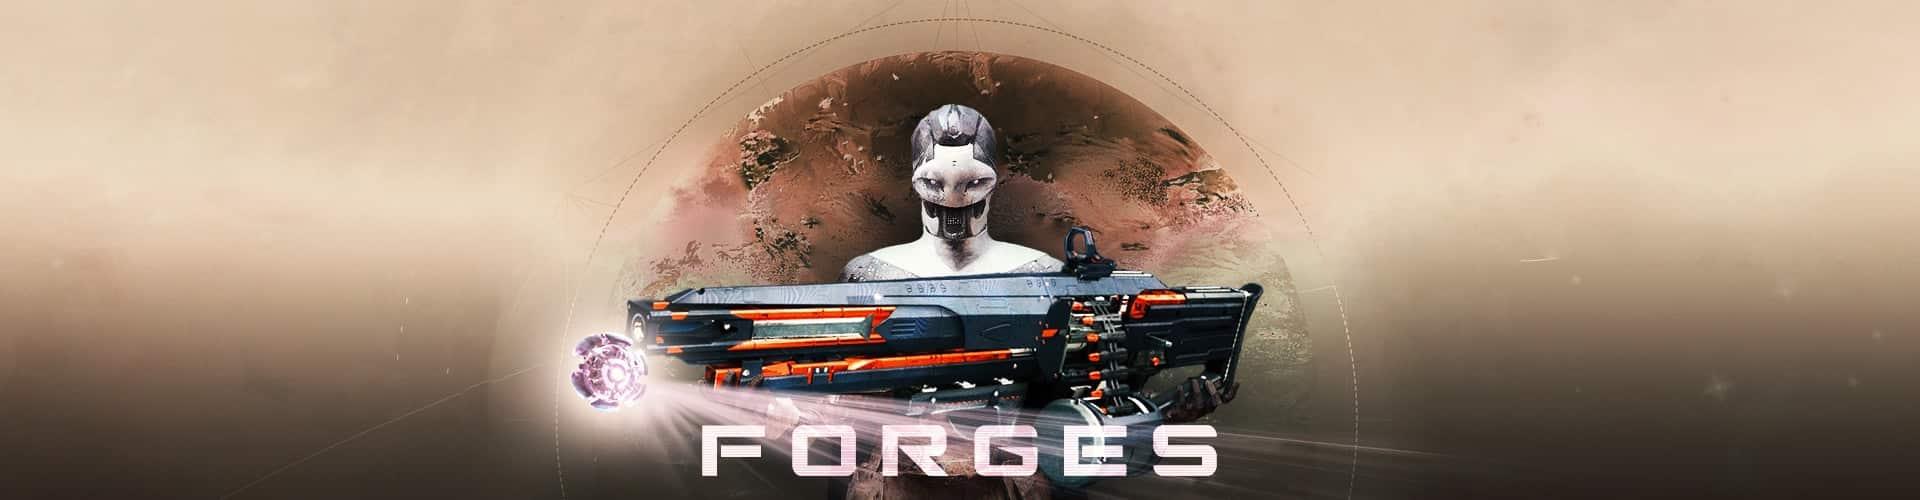 Destiny 2 Forge boosting